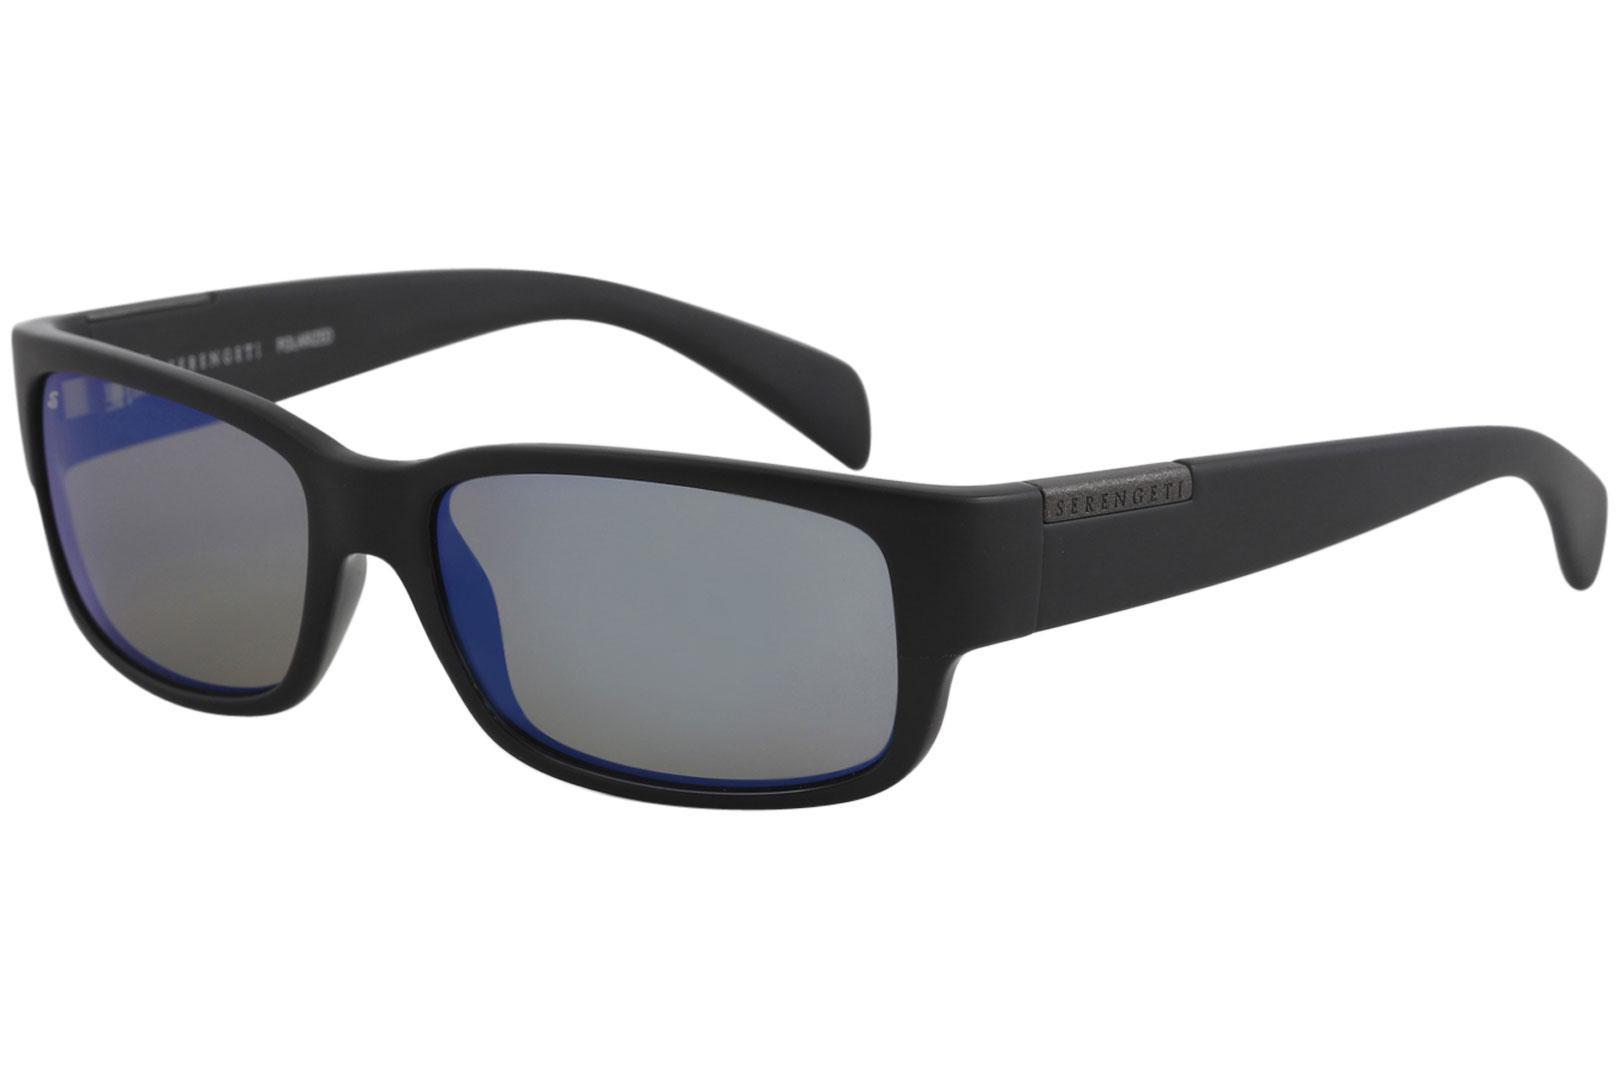 1e55f97af698 Serengeti Men s Merano Fashion Rectangle Polarized Sunglasses